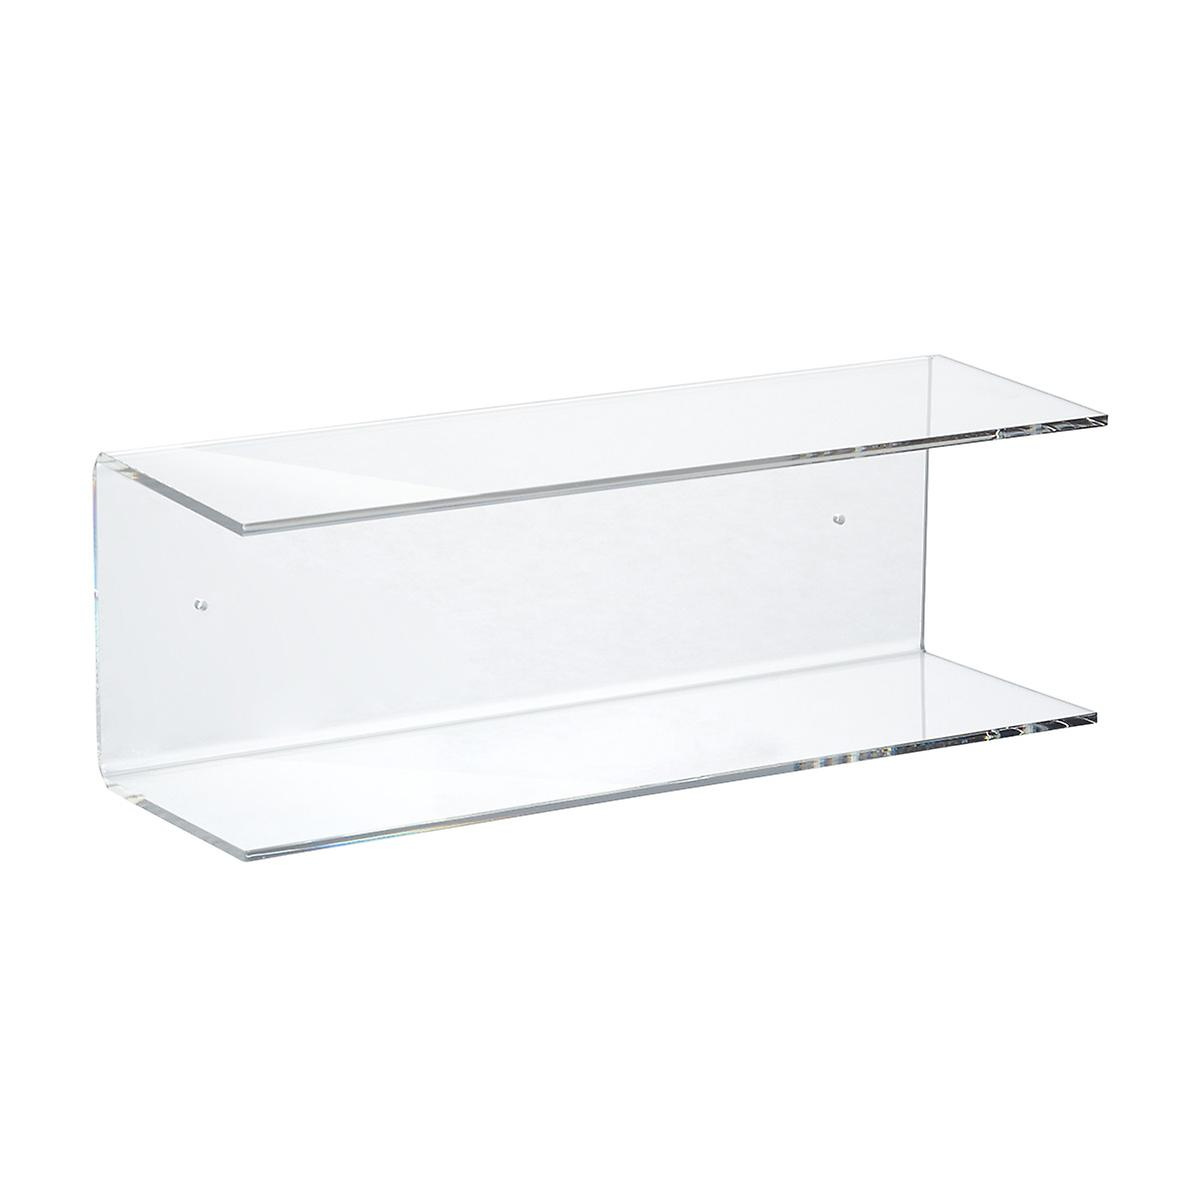 Double Acrylic Wall Shelf The